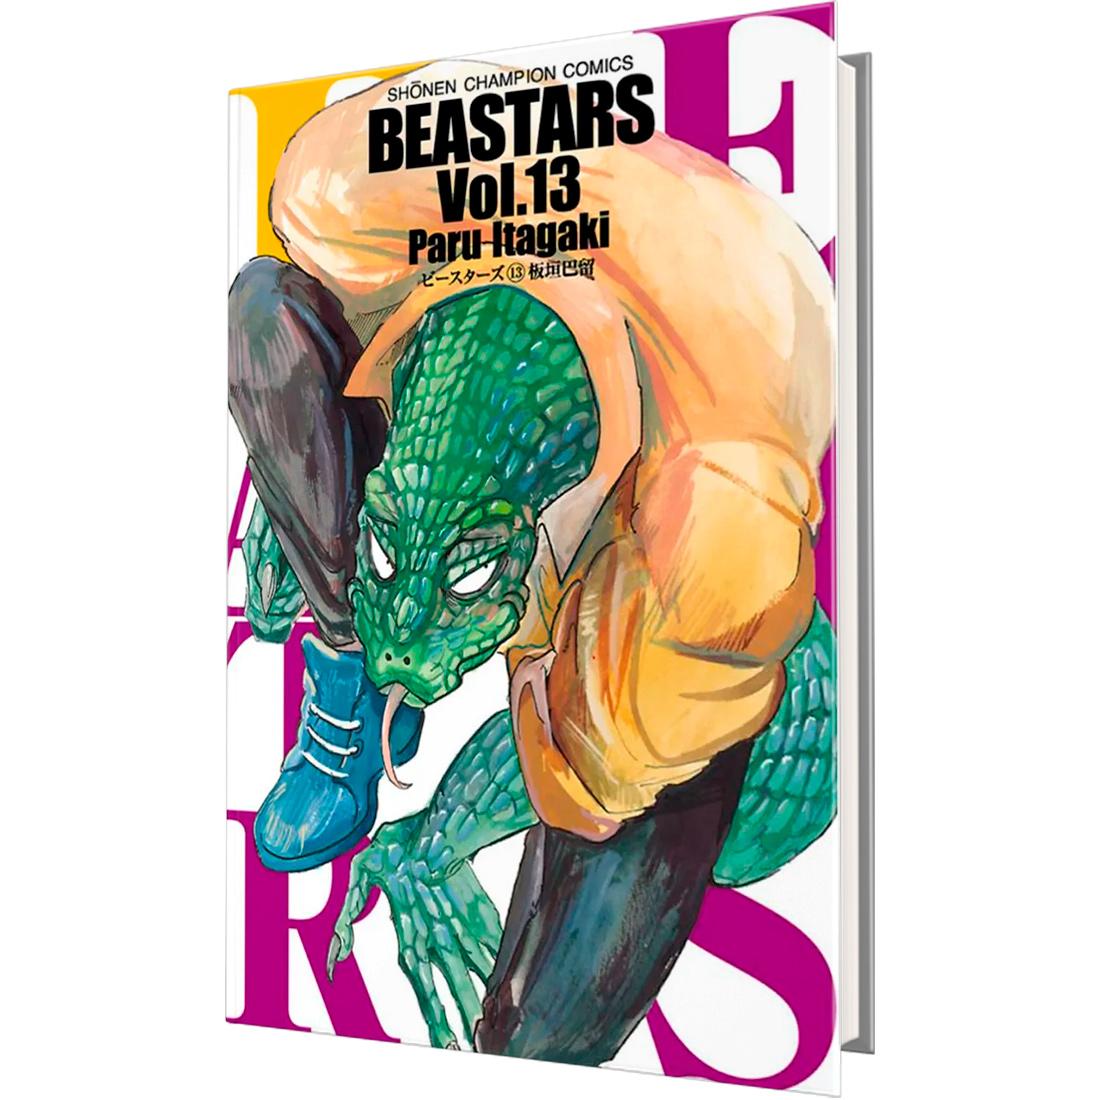 Beastars Vol. 13